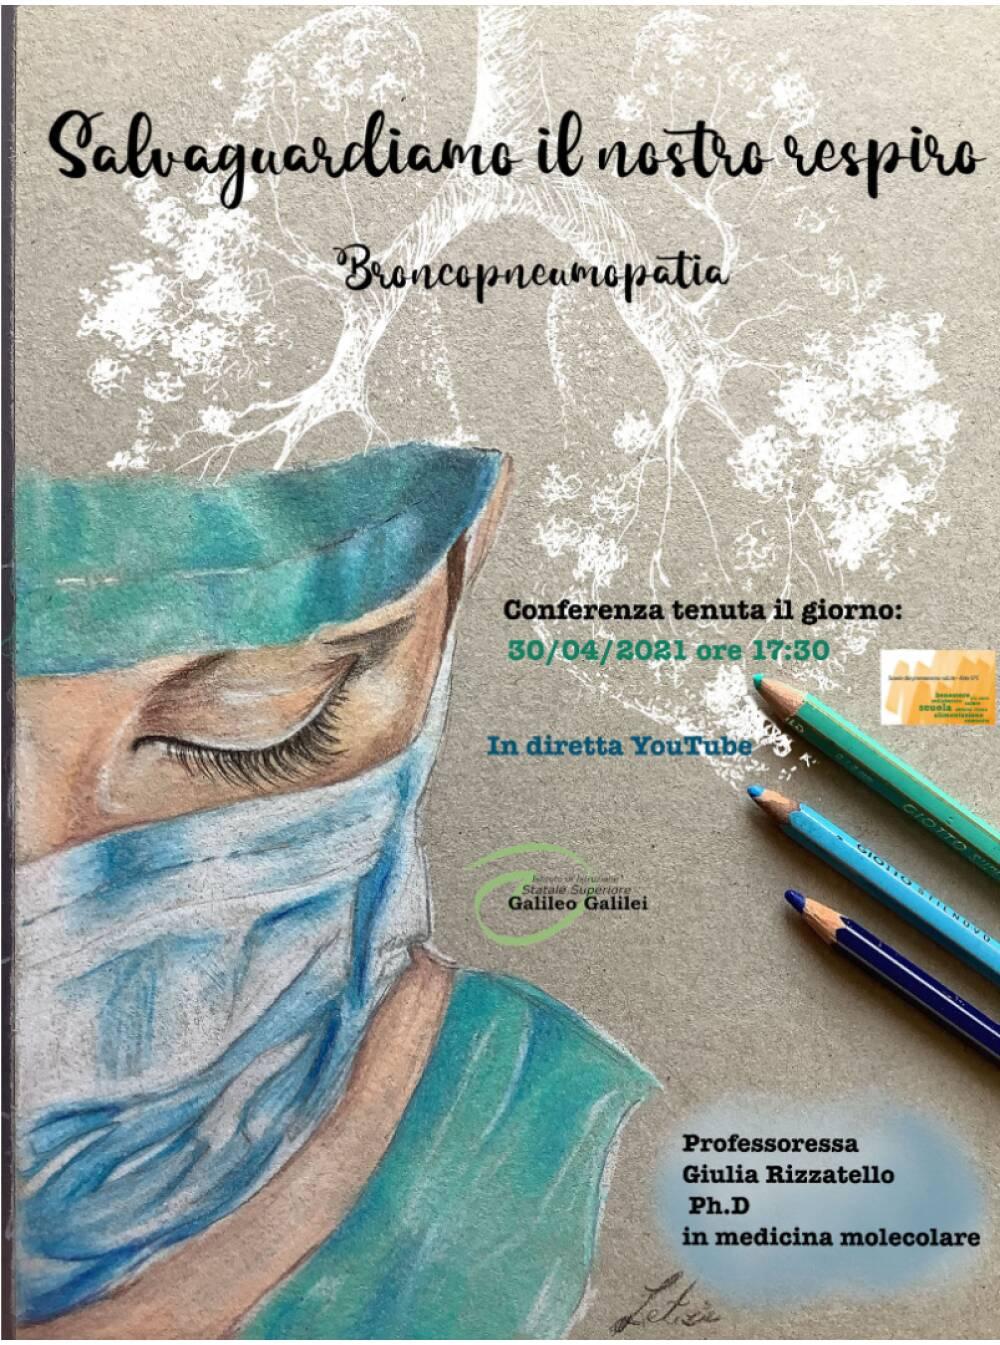 locandina broncopneumologia 30 aprile 2021